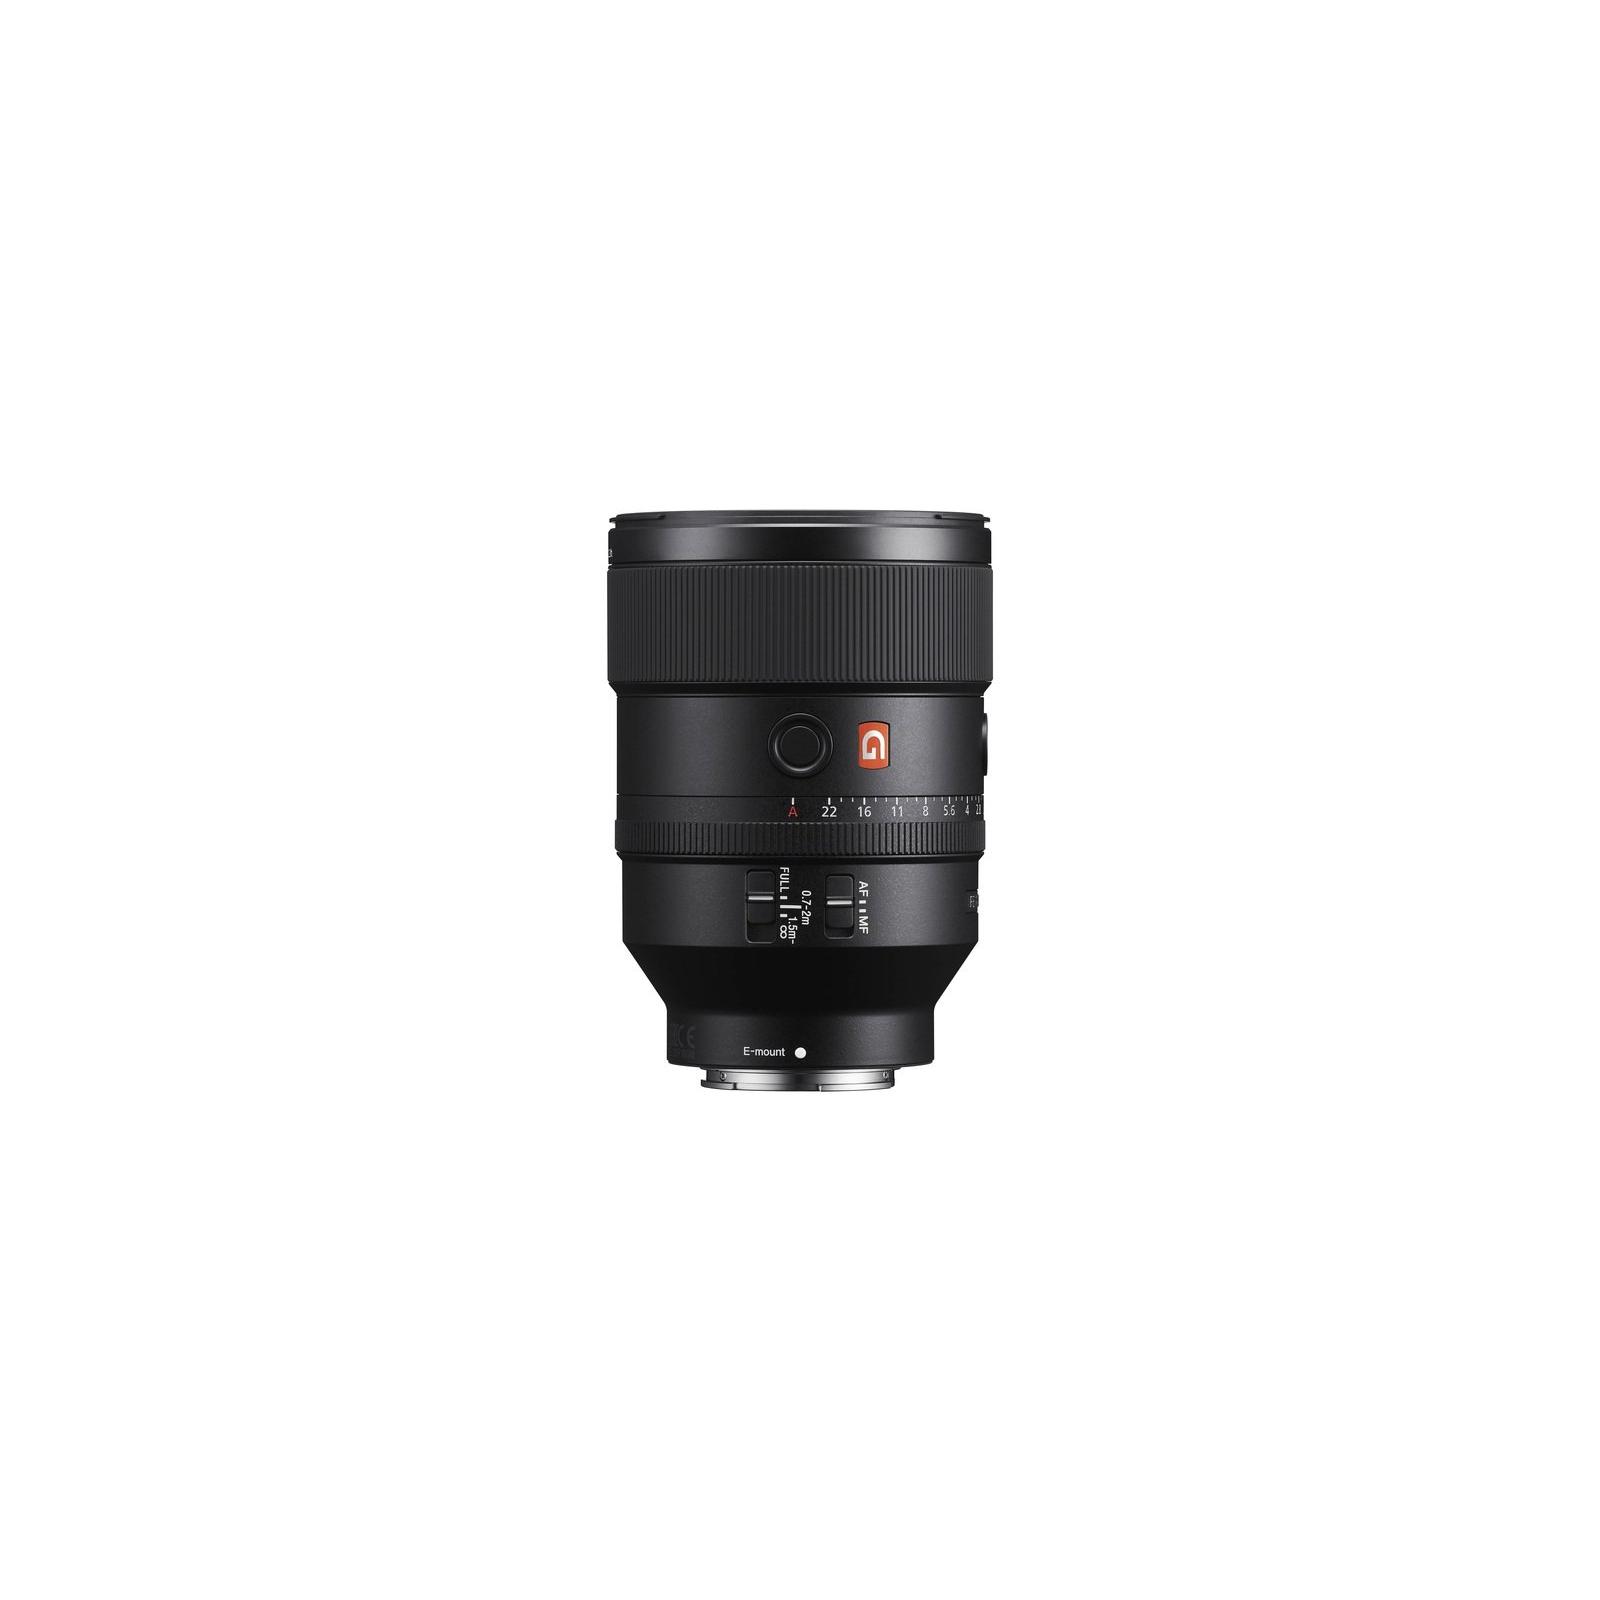 Объектив Sony 135mm, f/1.8 GM для камер NEX FF (SEL135F18GM.SYX) изображение 3